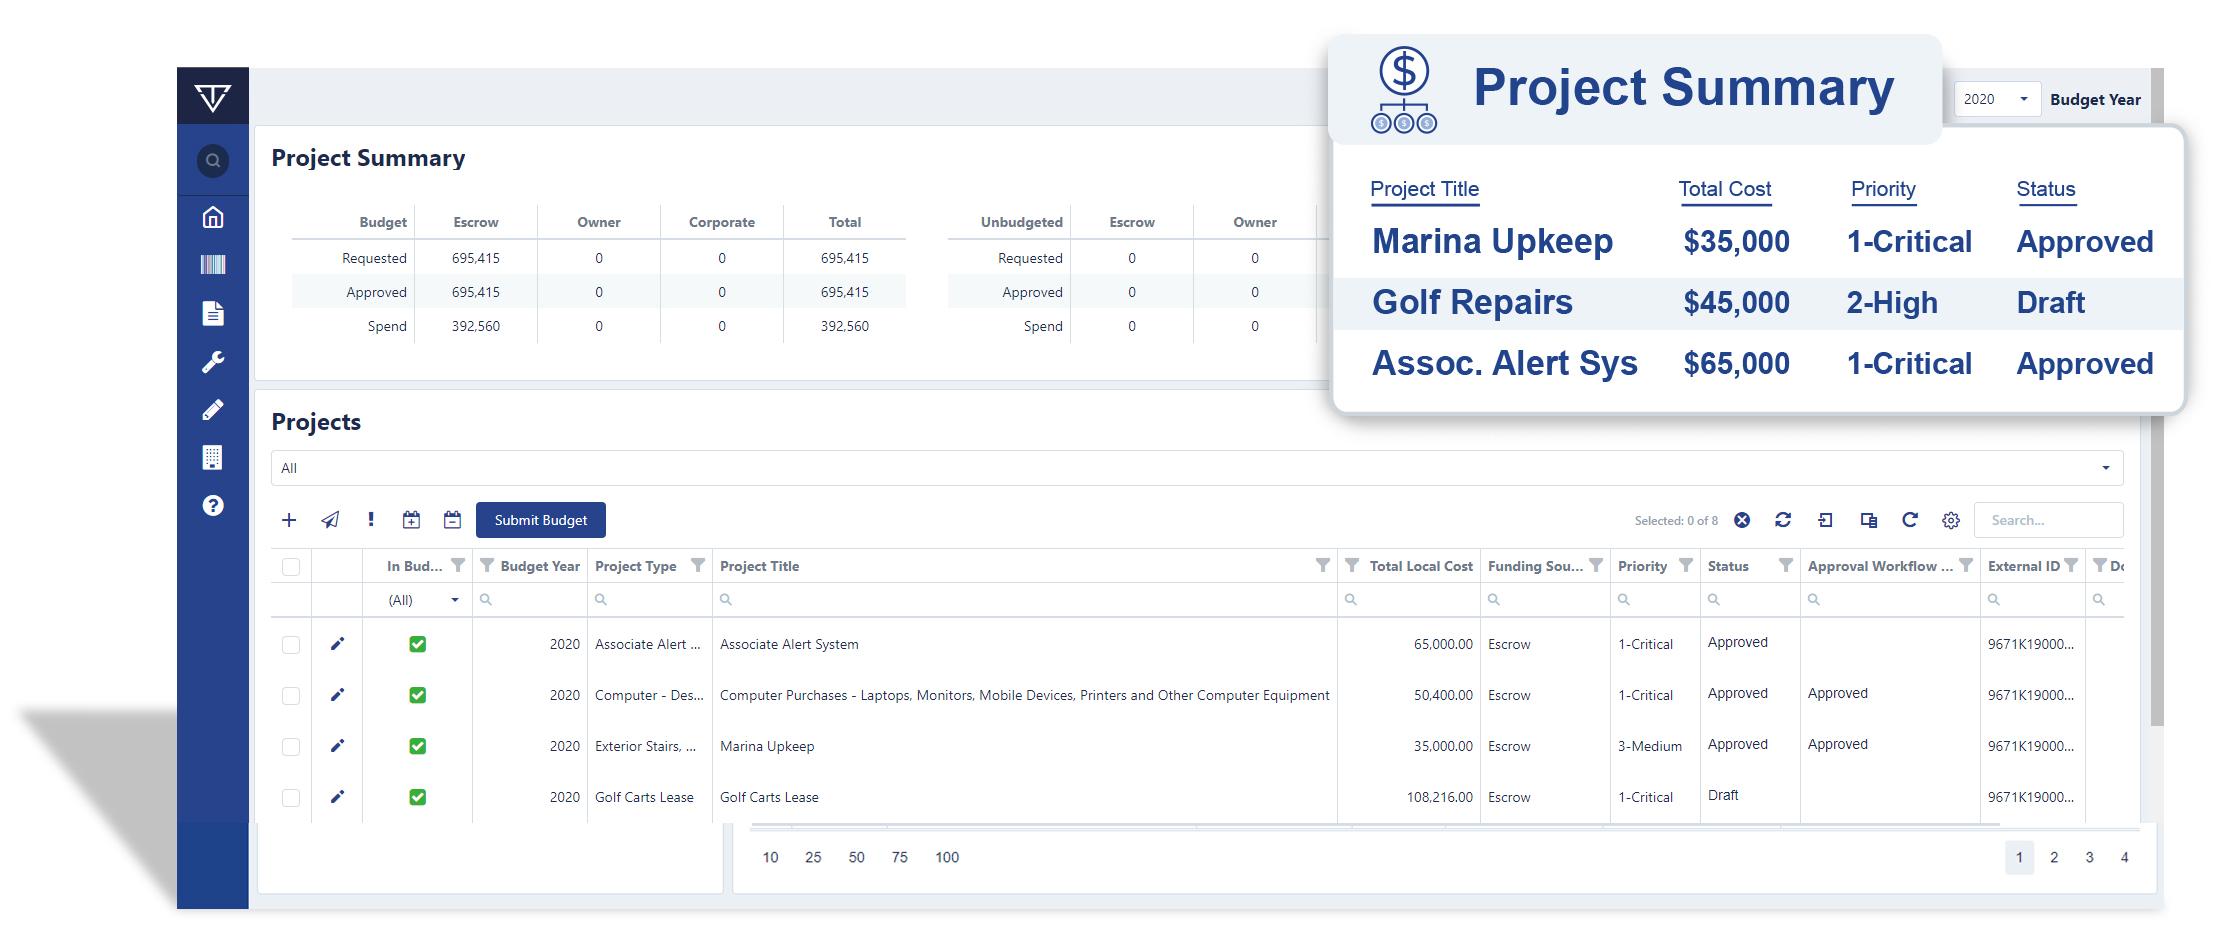 Transcendent Capital Planning Budgeting Module Enterprise Asset Management Software - Summary Screen